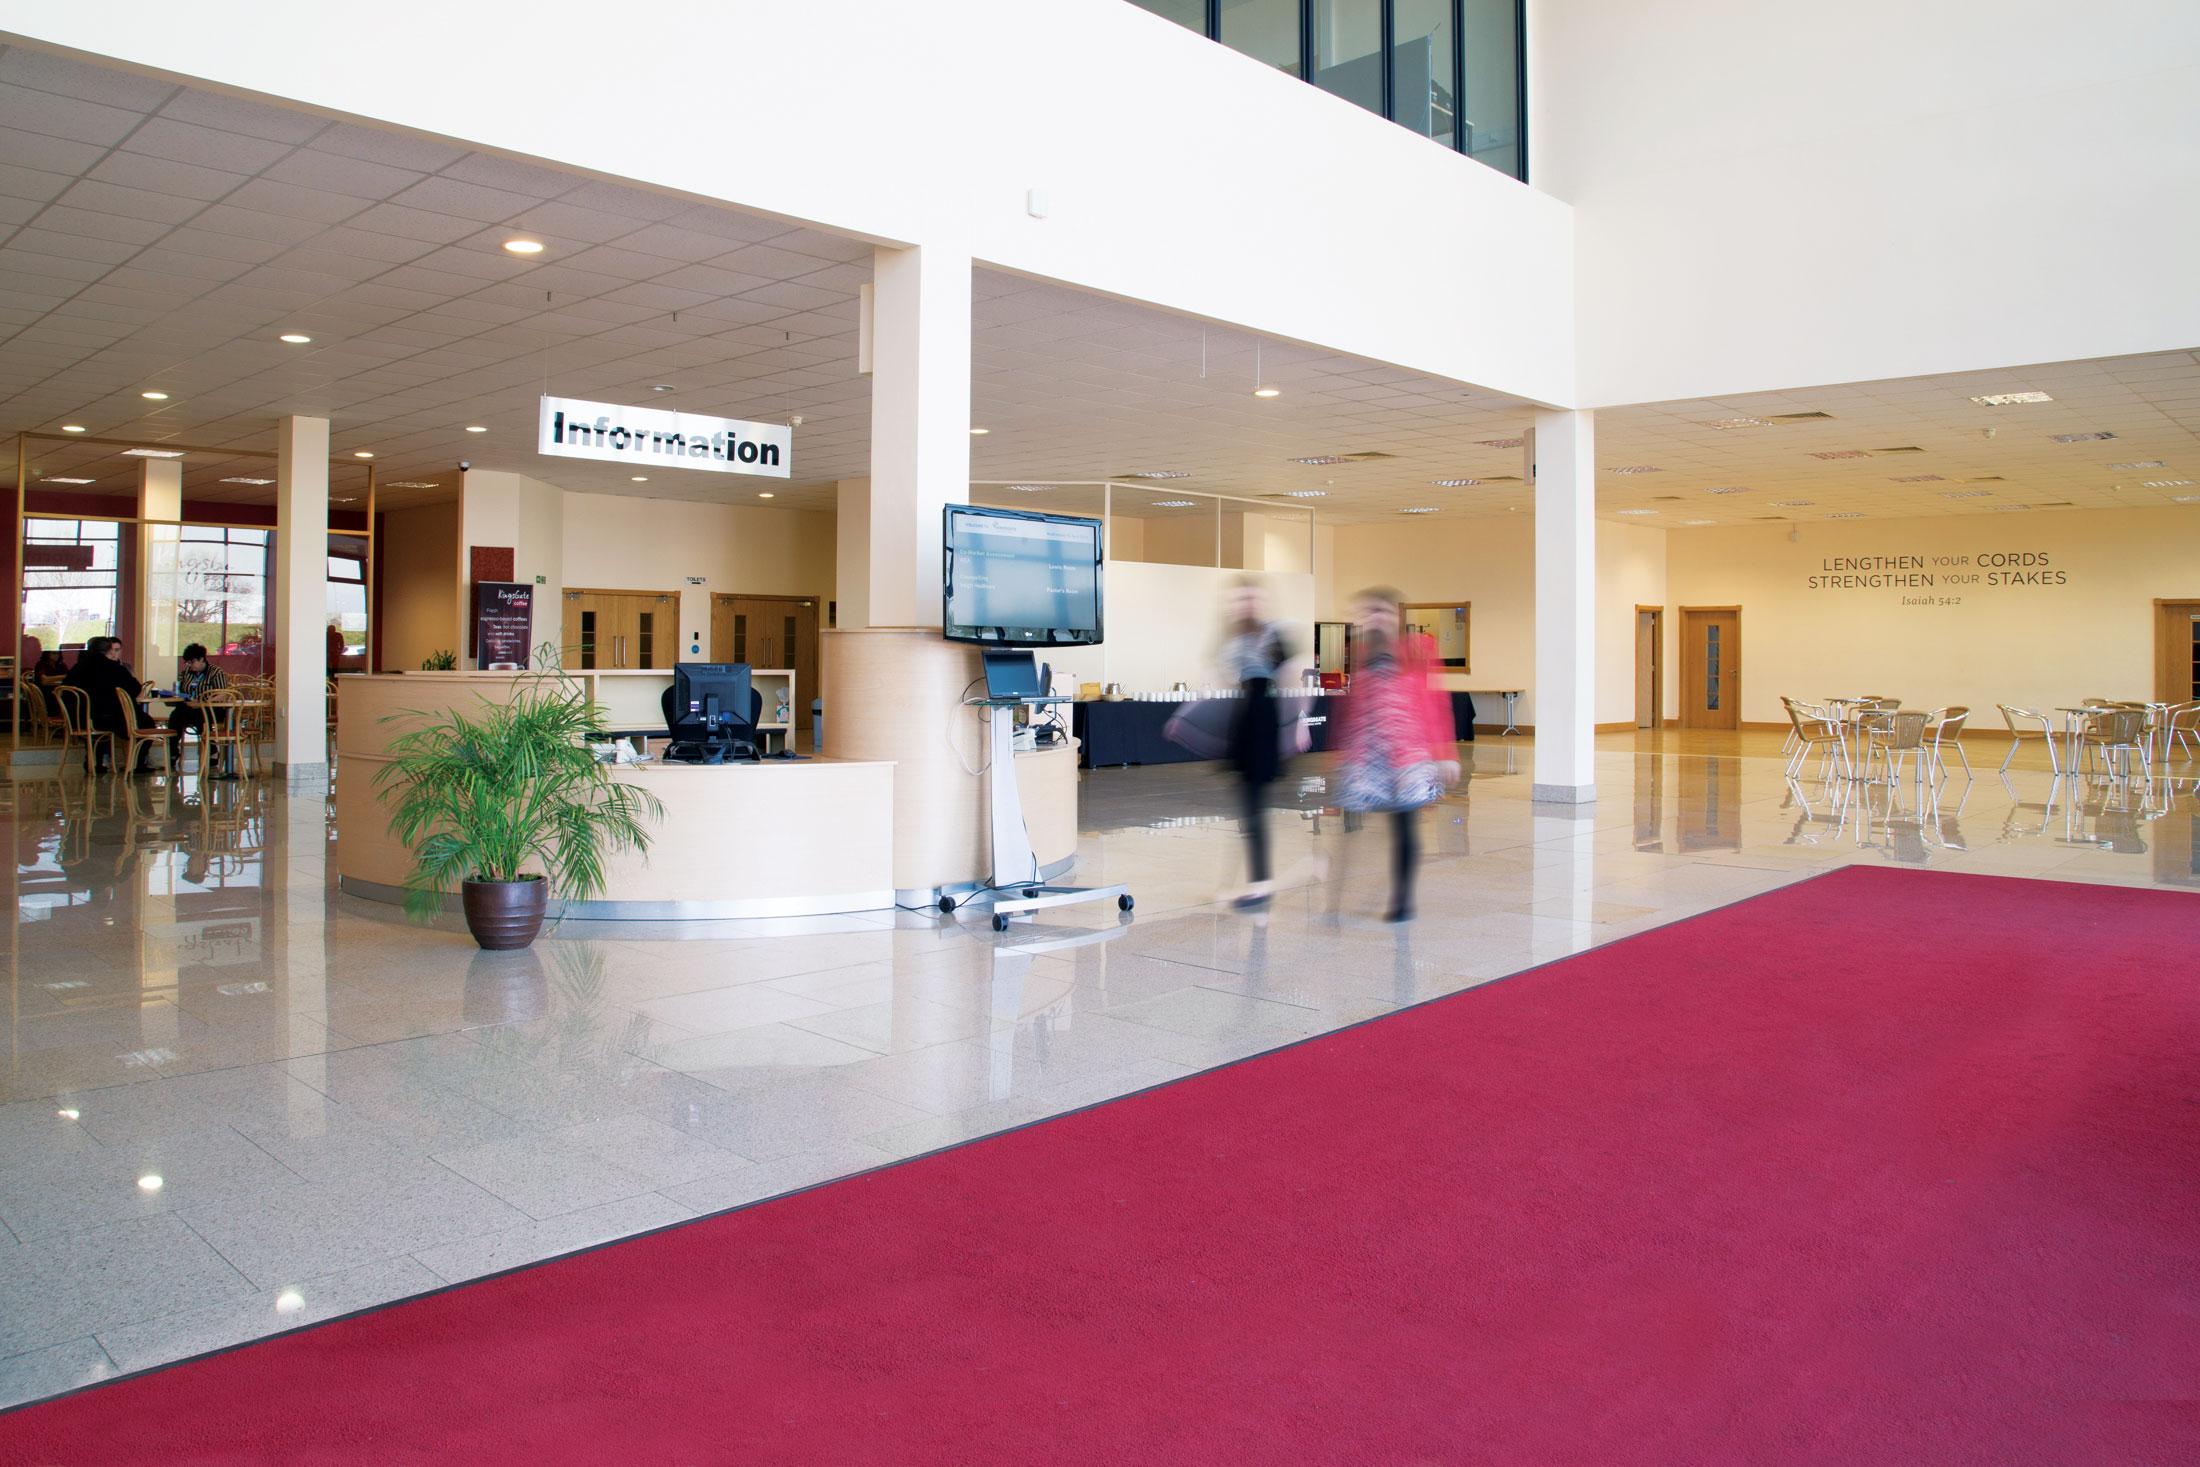 Kingsgate Conference Centre's spacious Atrium